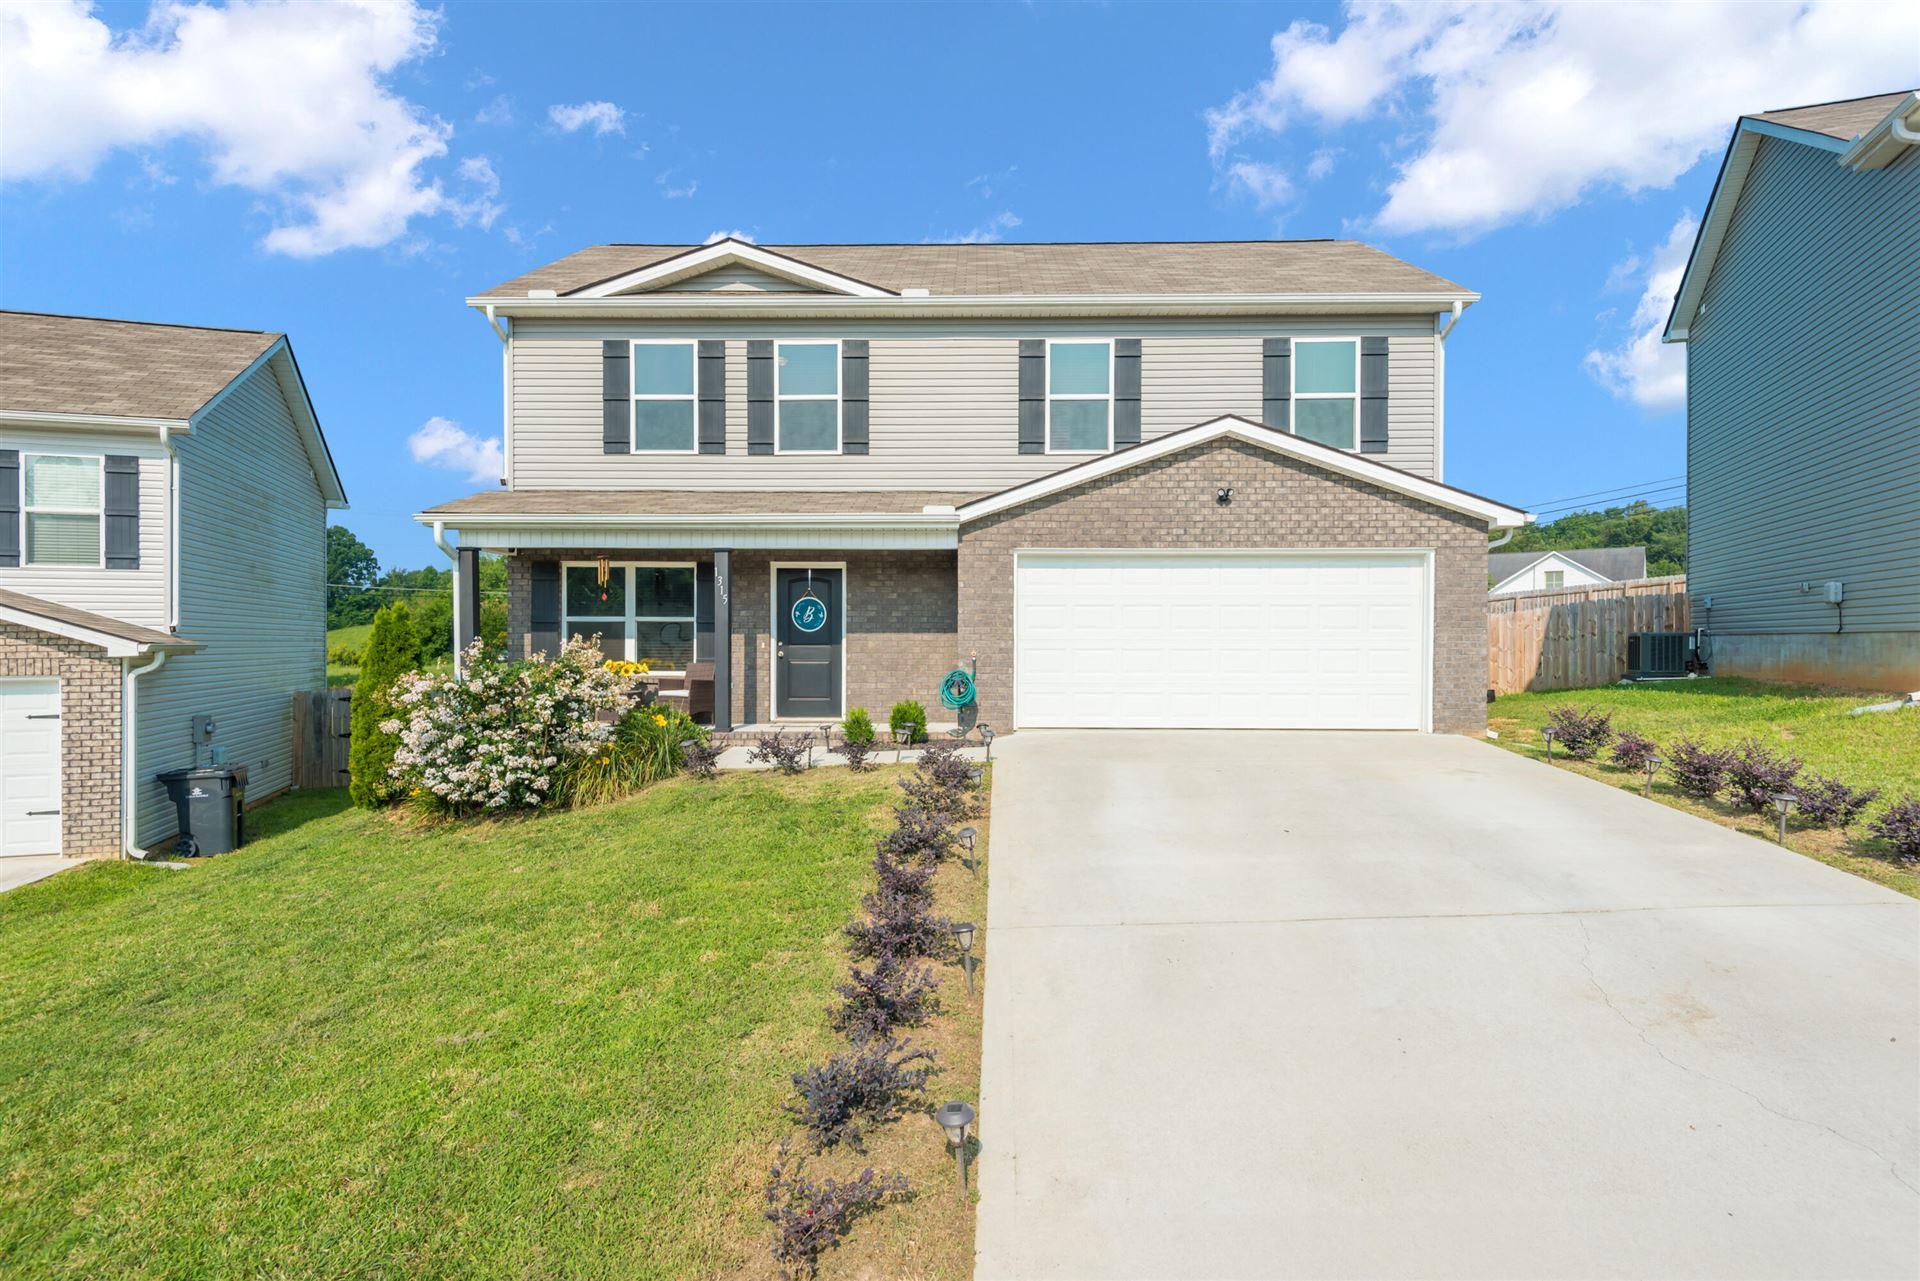 Photo of 1315 Zamora Lane, Knoxville, TN 37912 (MLS # 1162495)